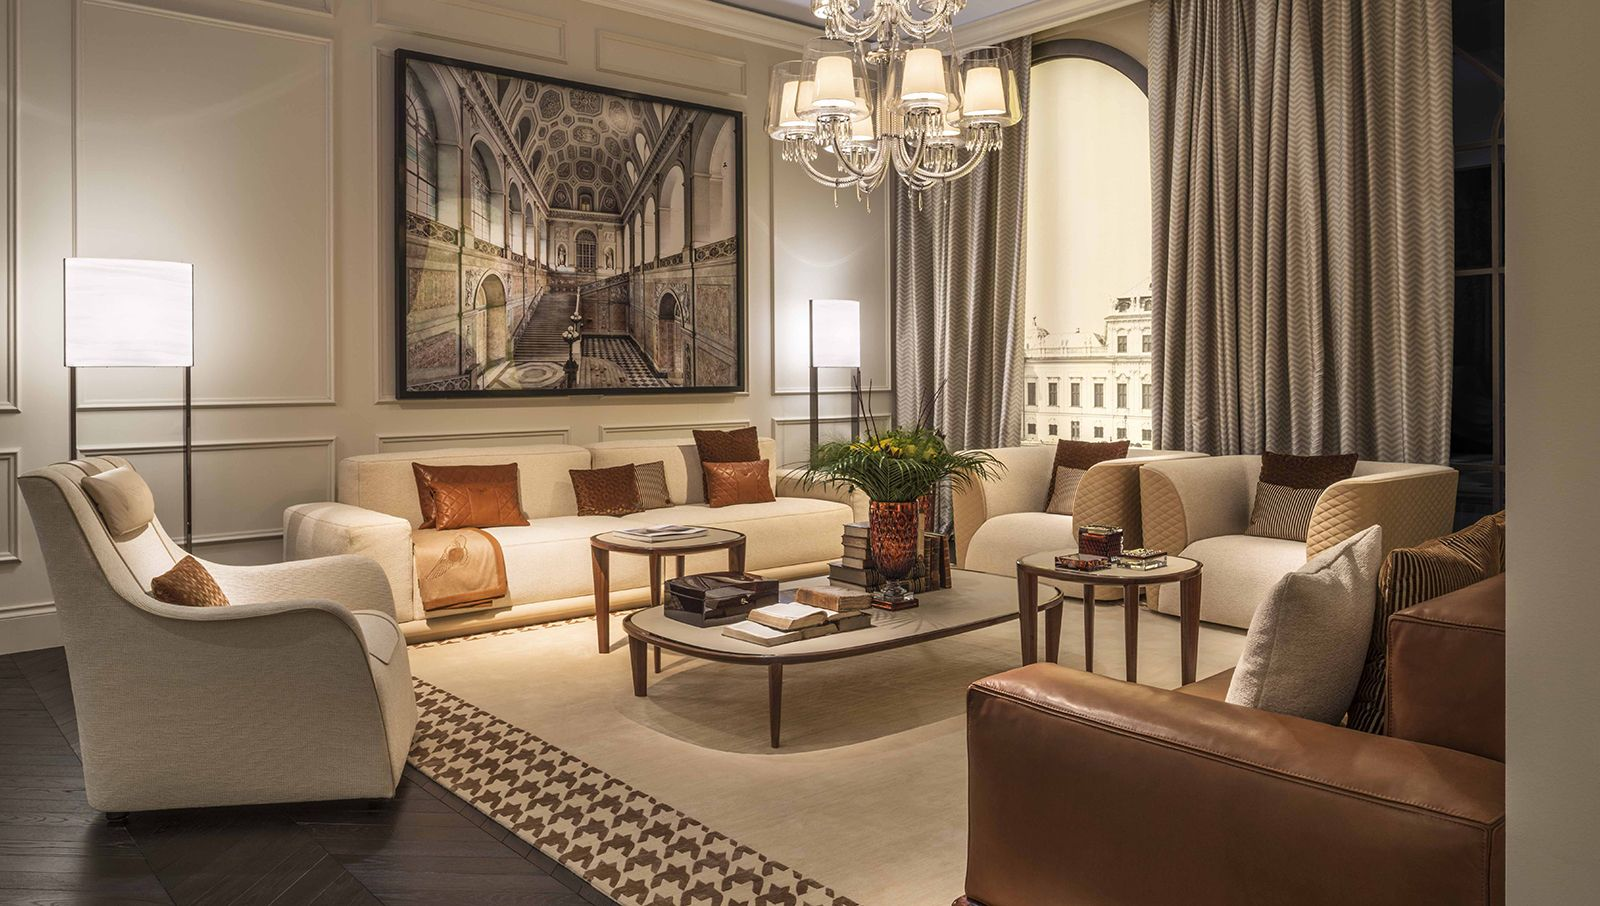 Bentley home luxury and elegant livingroom design with - Luxury living room interior design ...